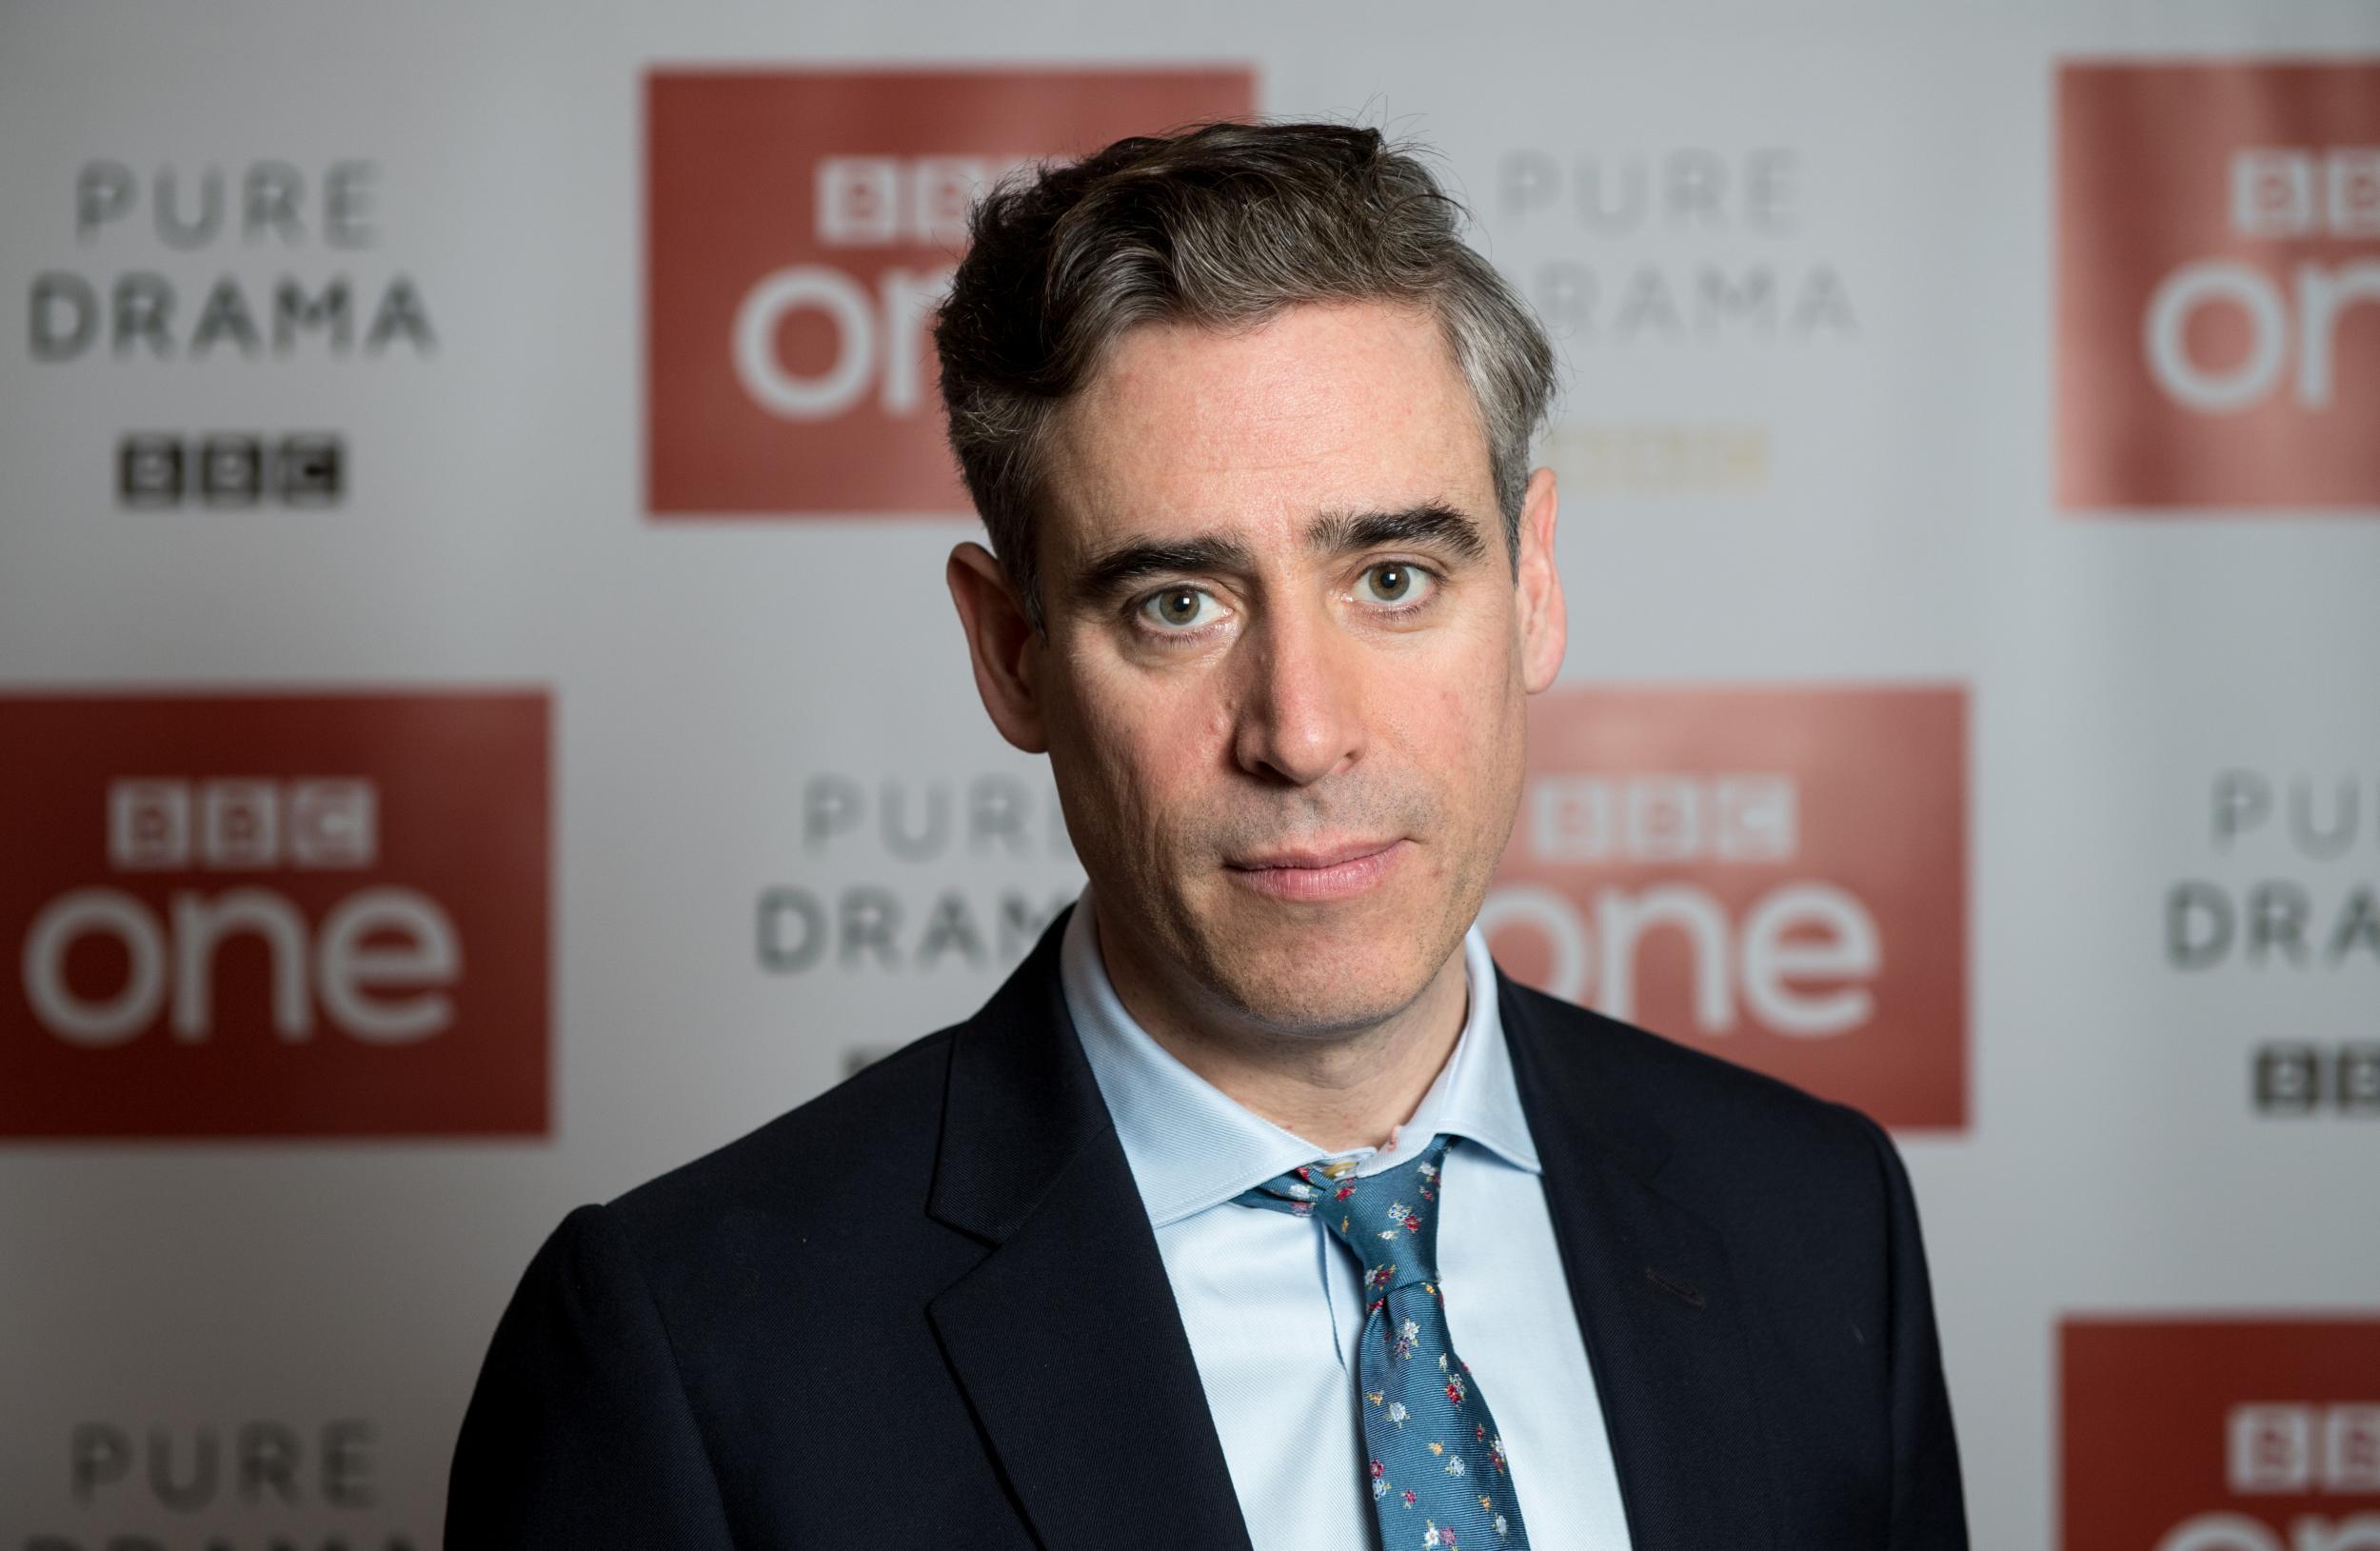 Stephen Mangan (born 1968)